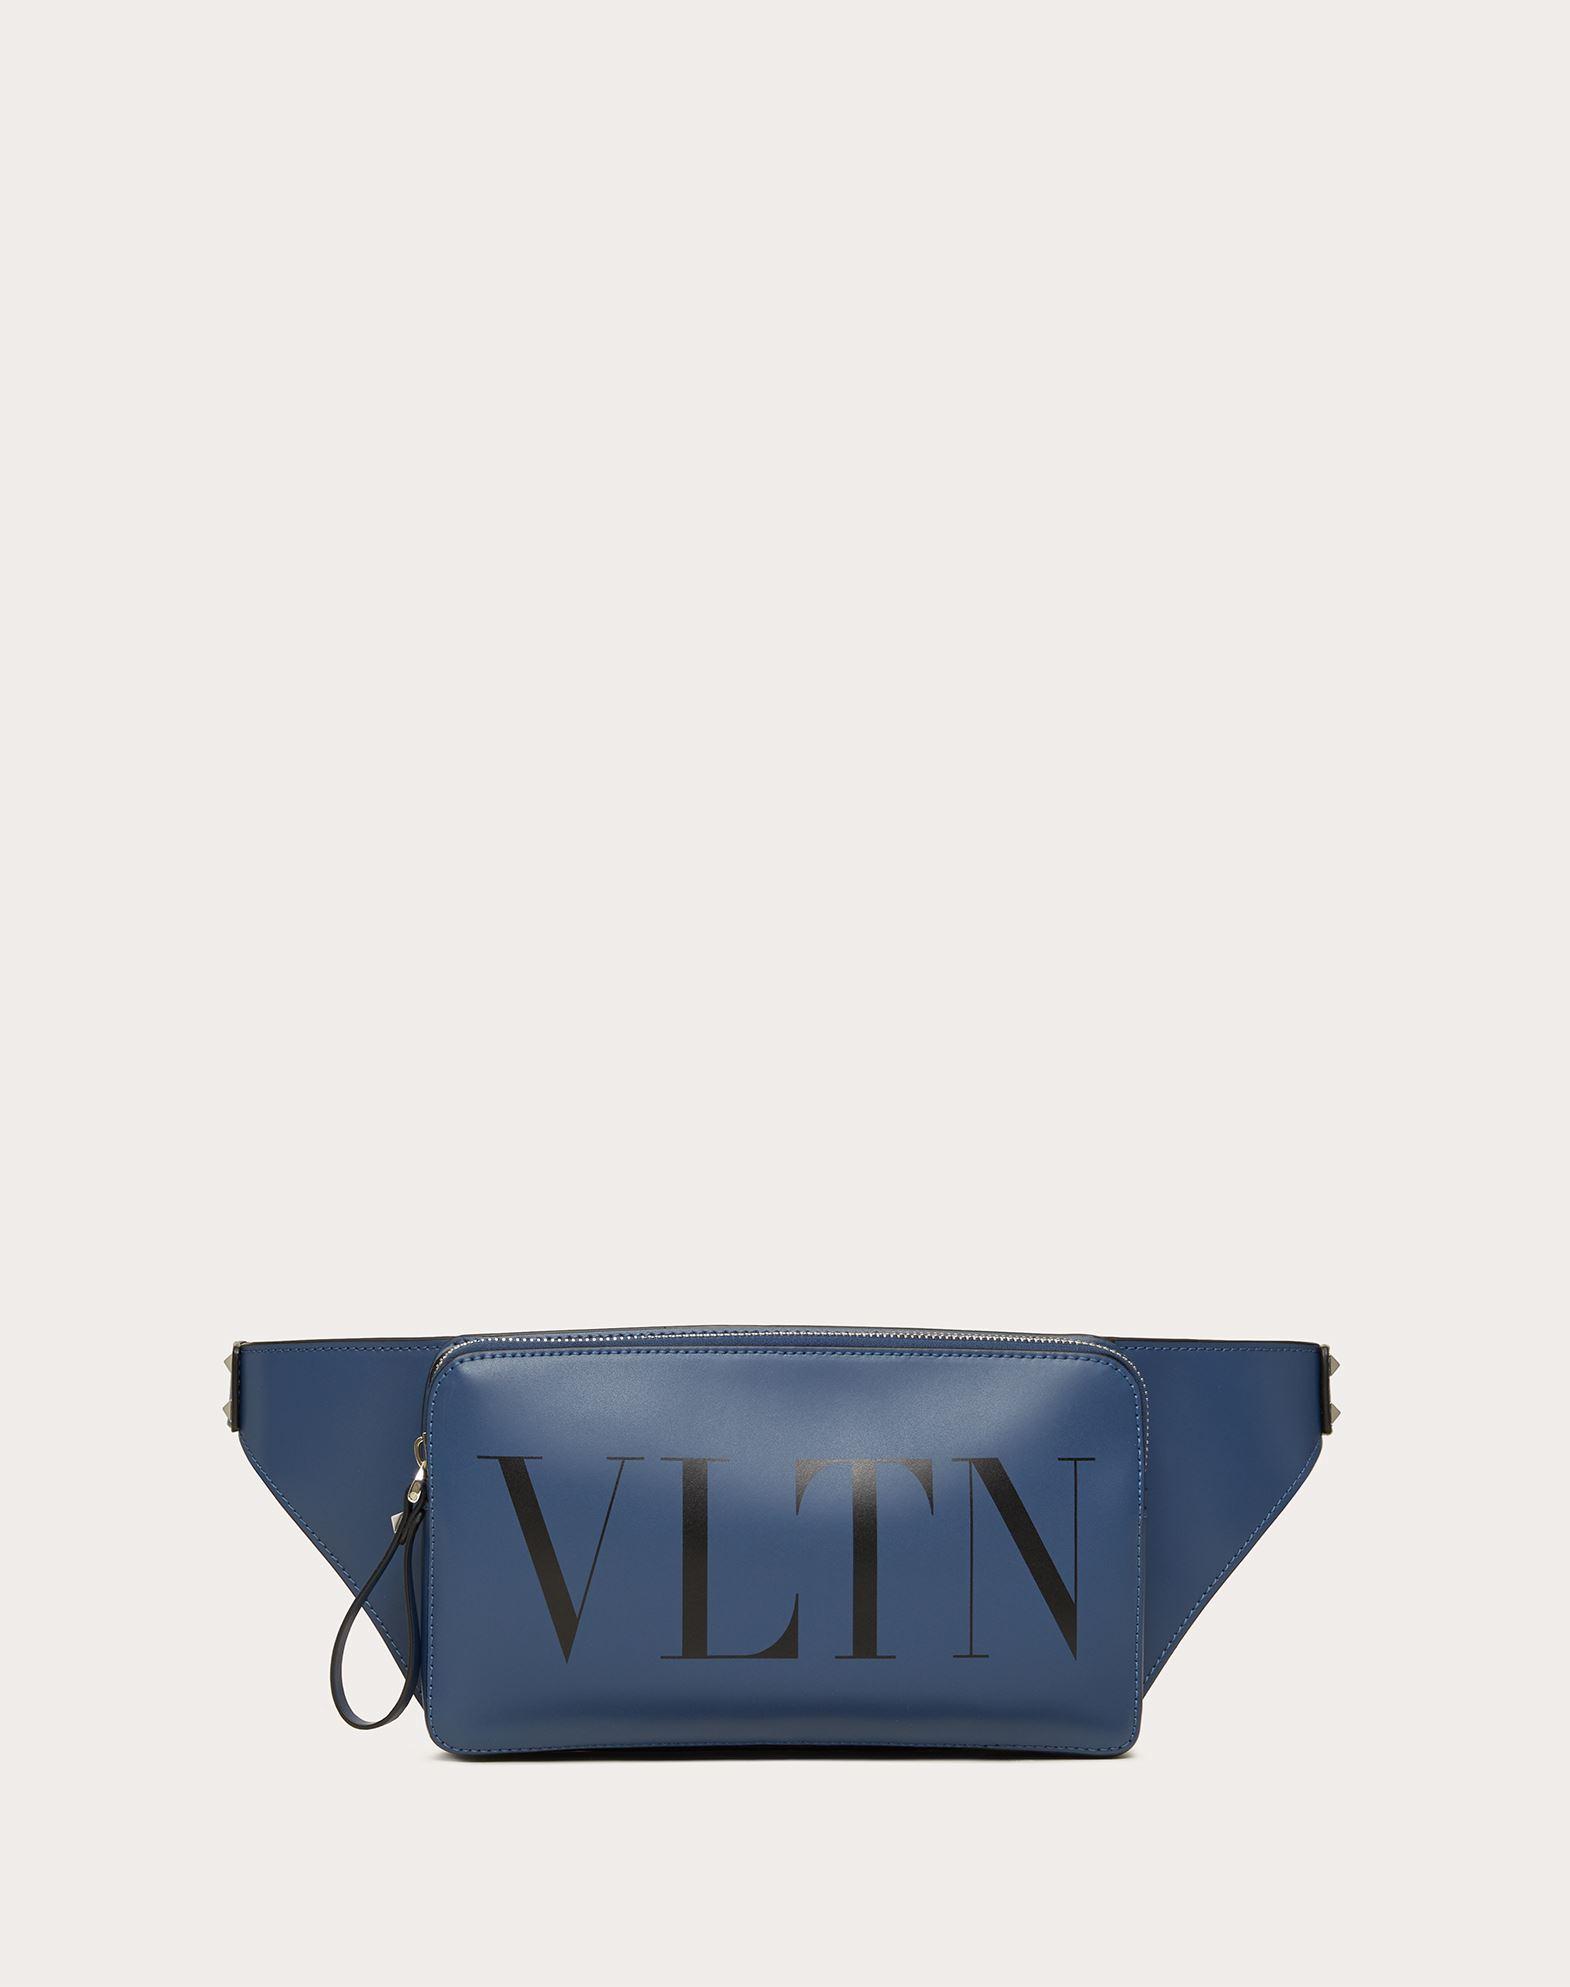 Valentino Garavani Uomo Vltn Leather Belt Bag In Indigo